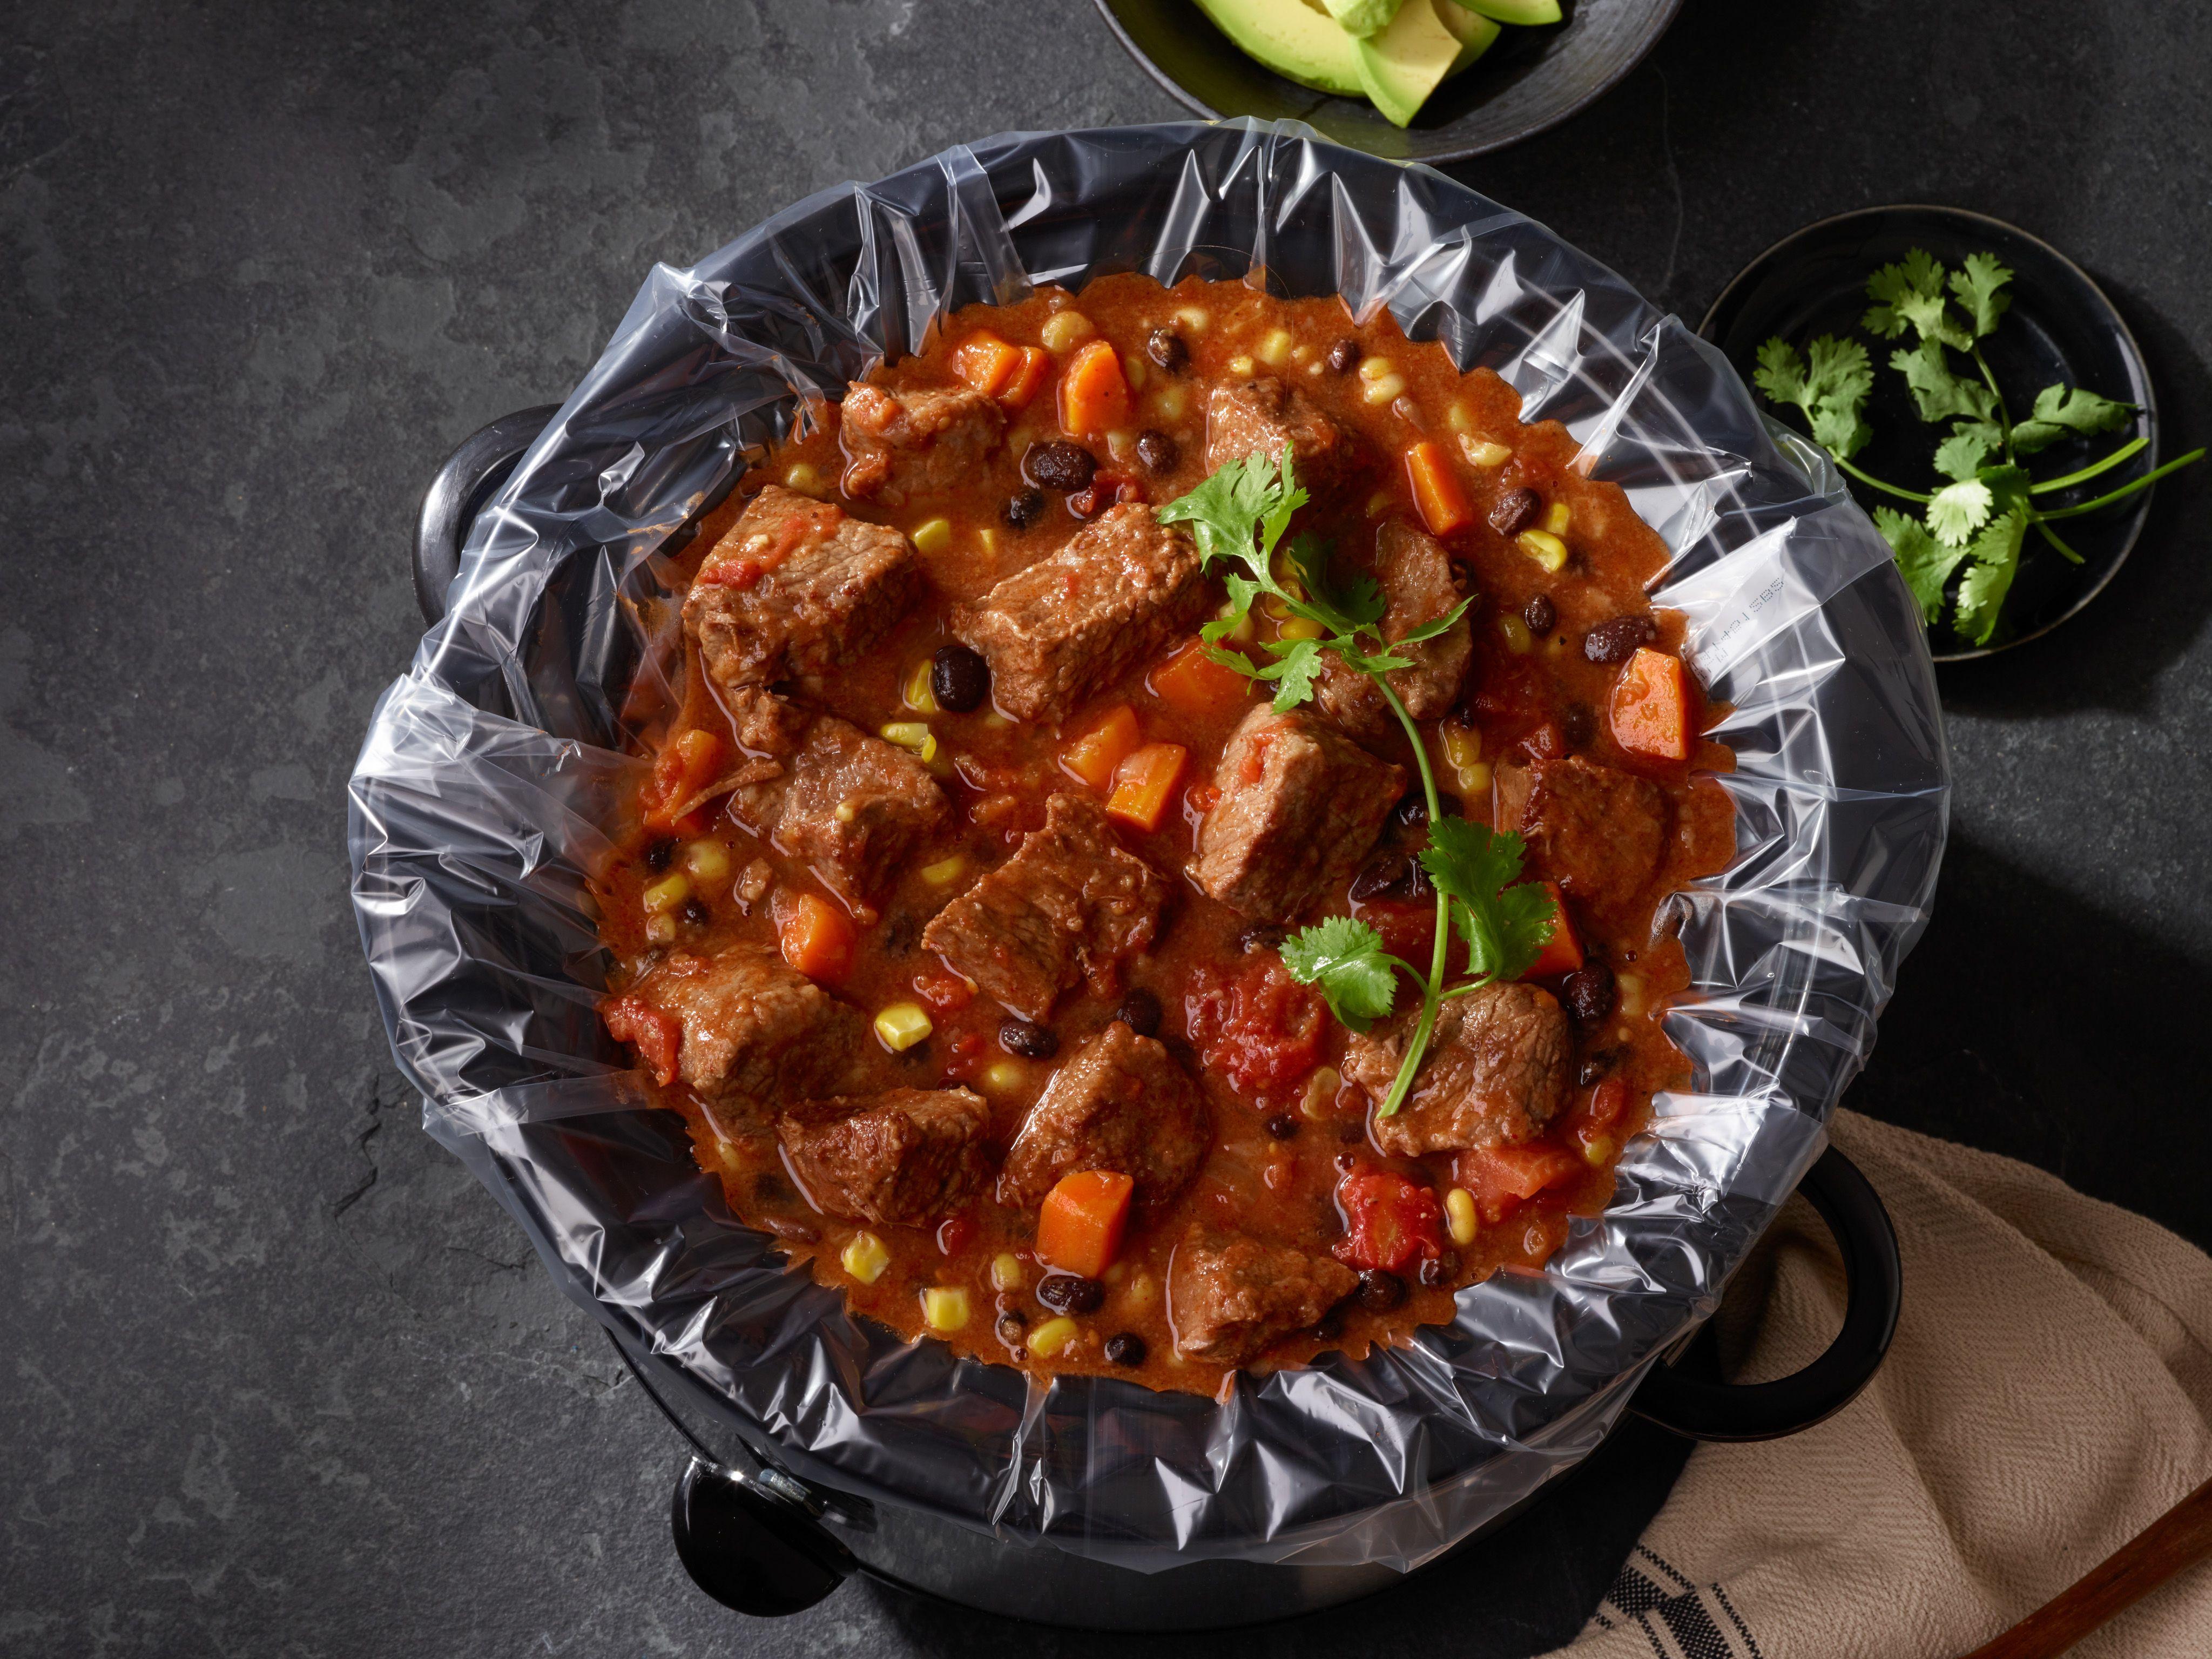 Slow Cooker Beef Stew Recipe Beef Recipes Slow Cooker Food